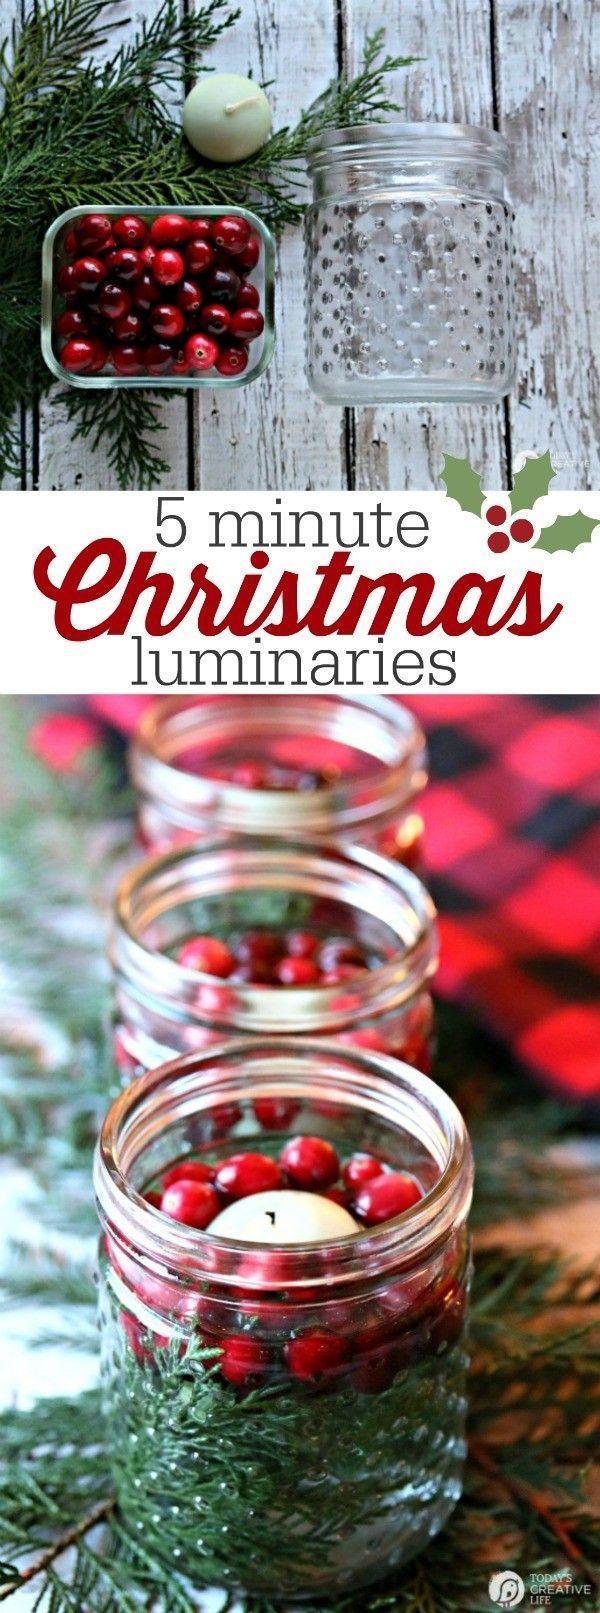 5 minute Christmas luminaries make fun seasonal home decor! Perfect centerpiece ...